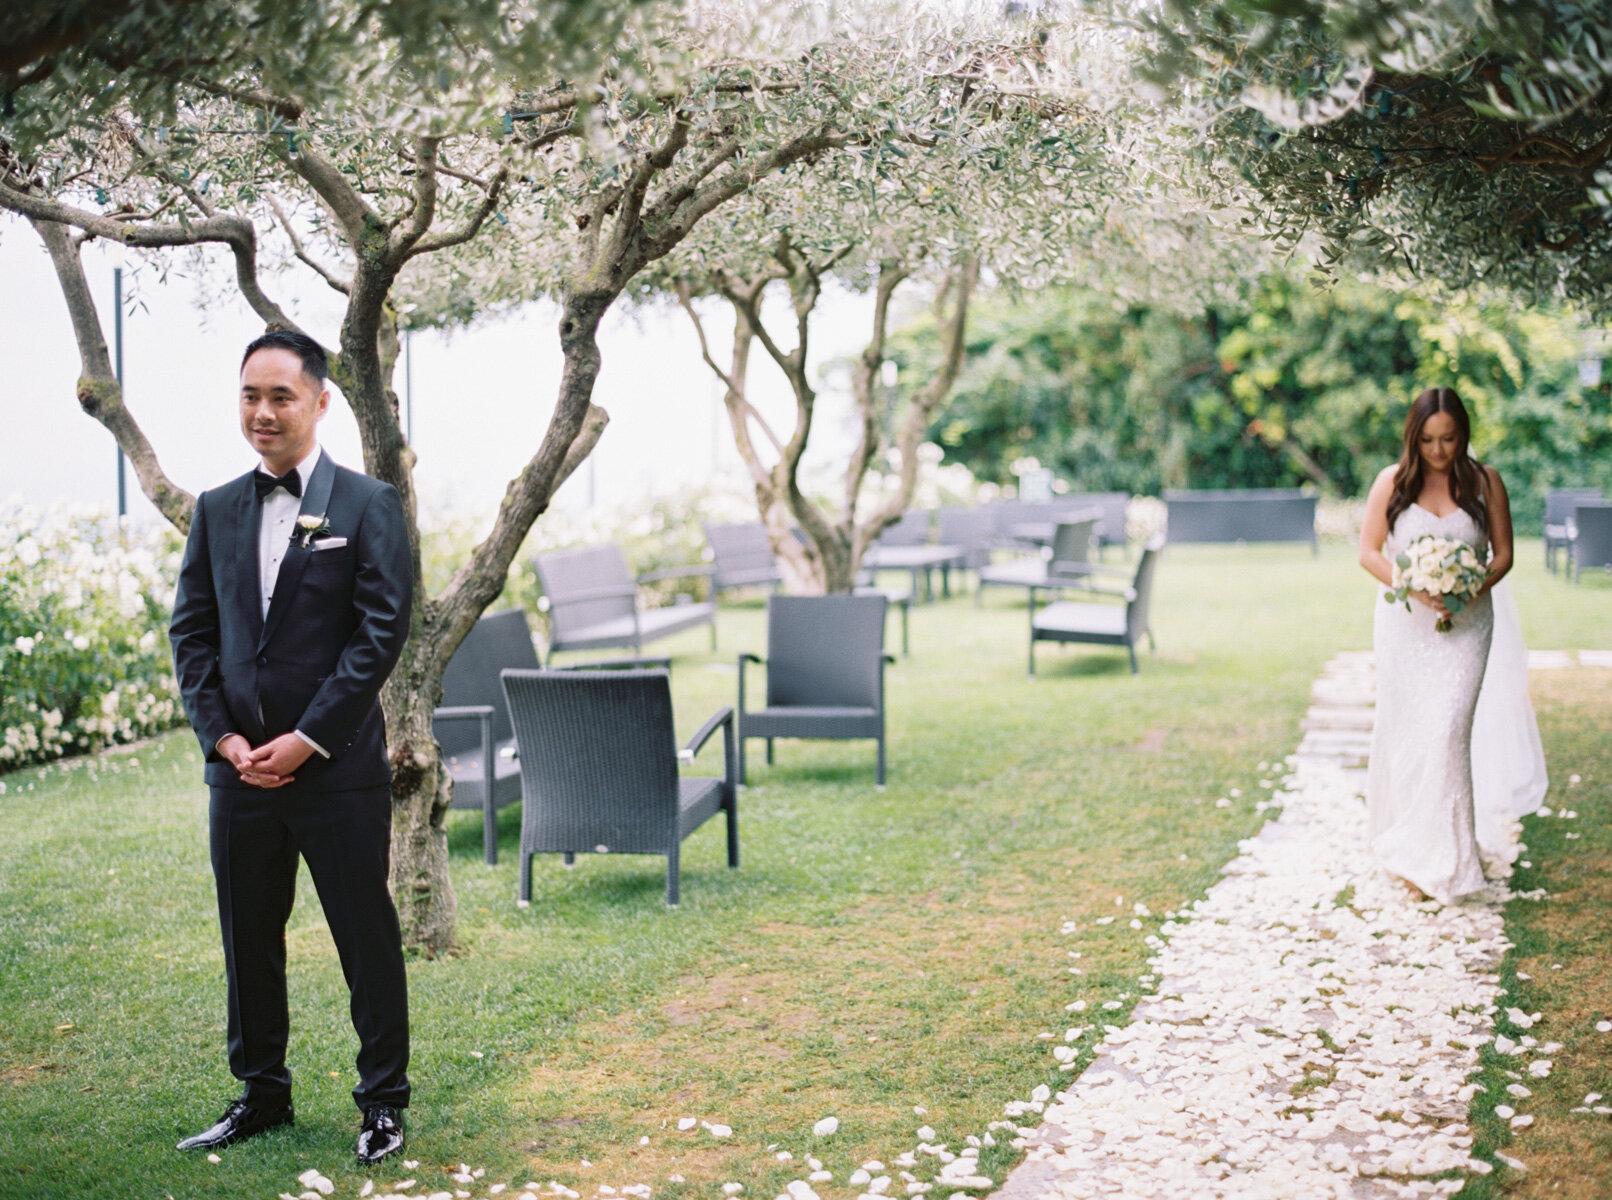 Belmond-Hotel-Caruso-ravello-elopement-Katie-Grant-destination-wedding (23 of 50).jpg